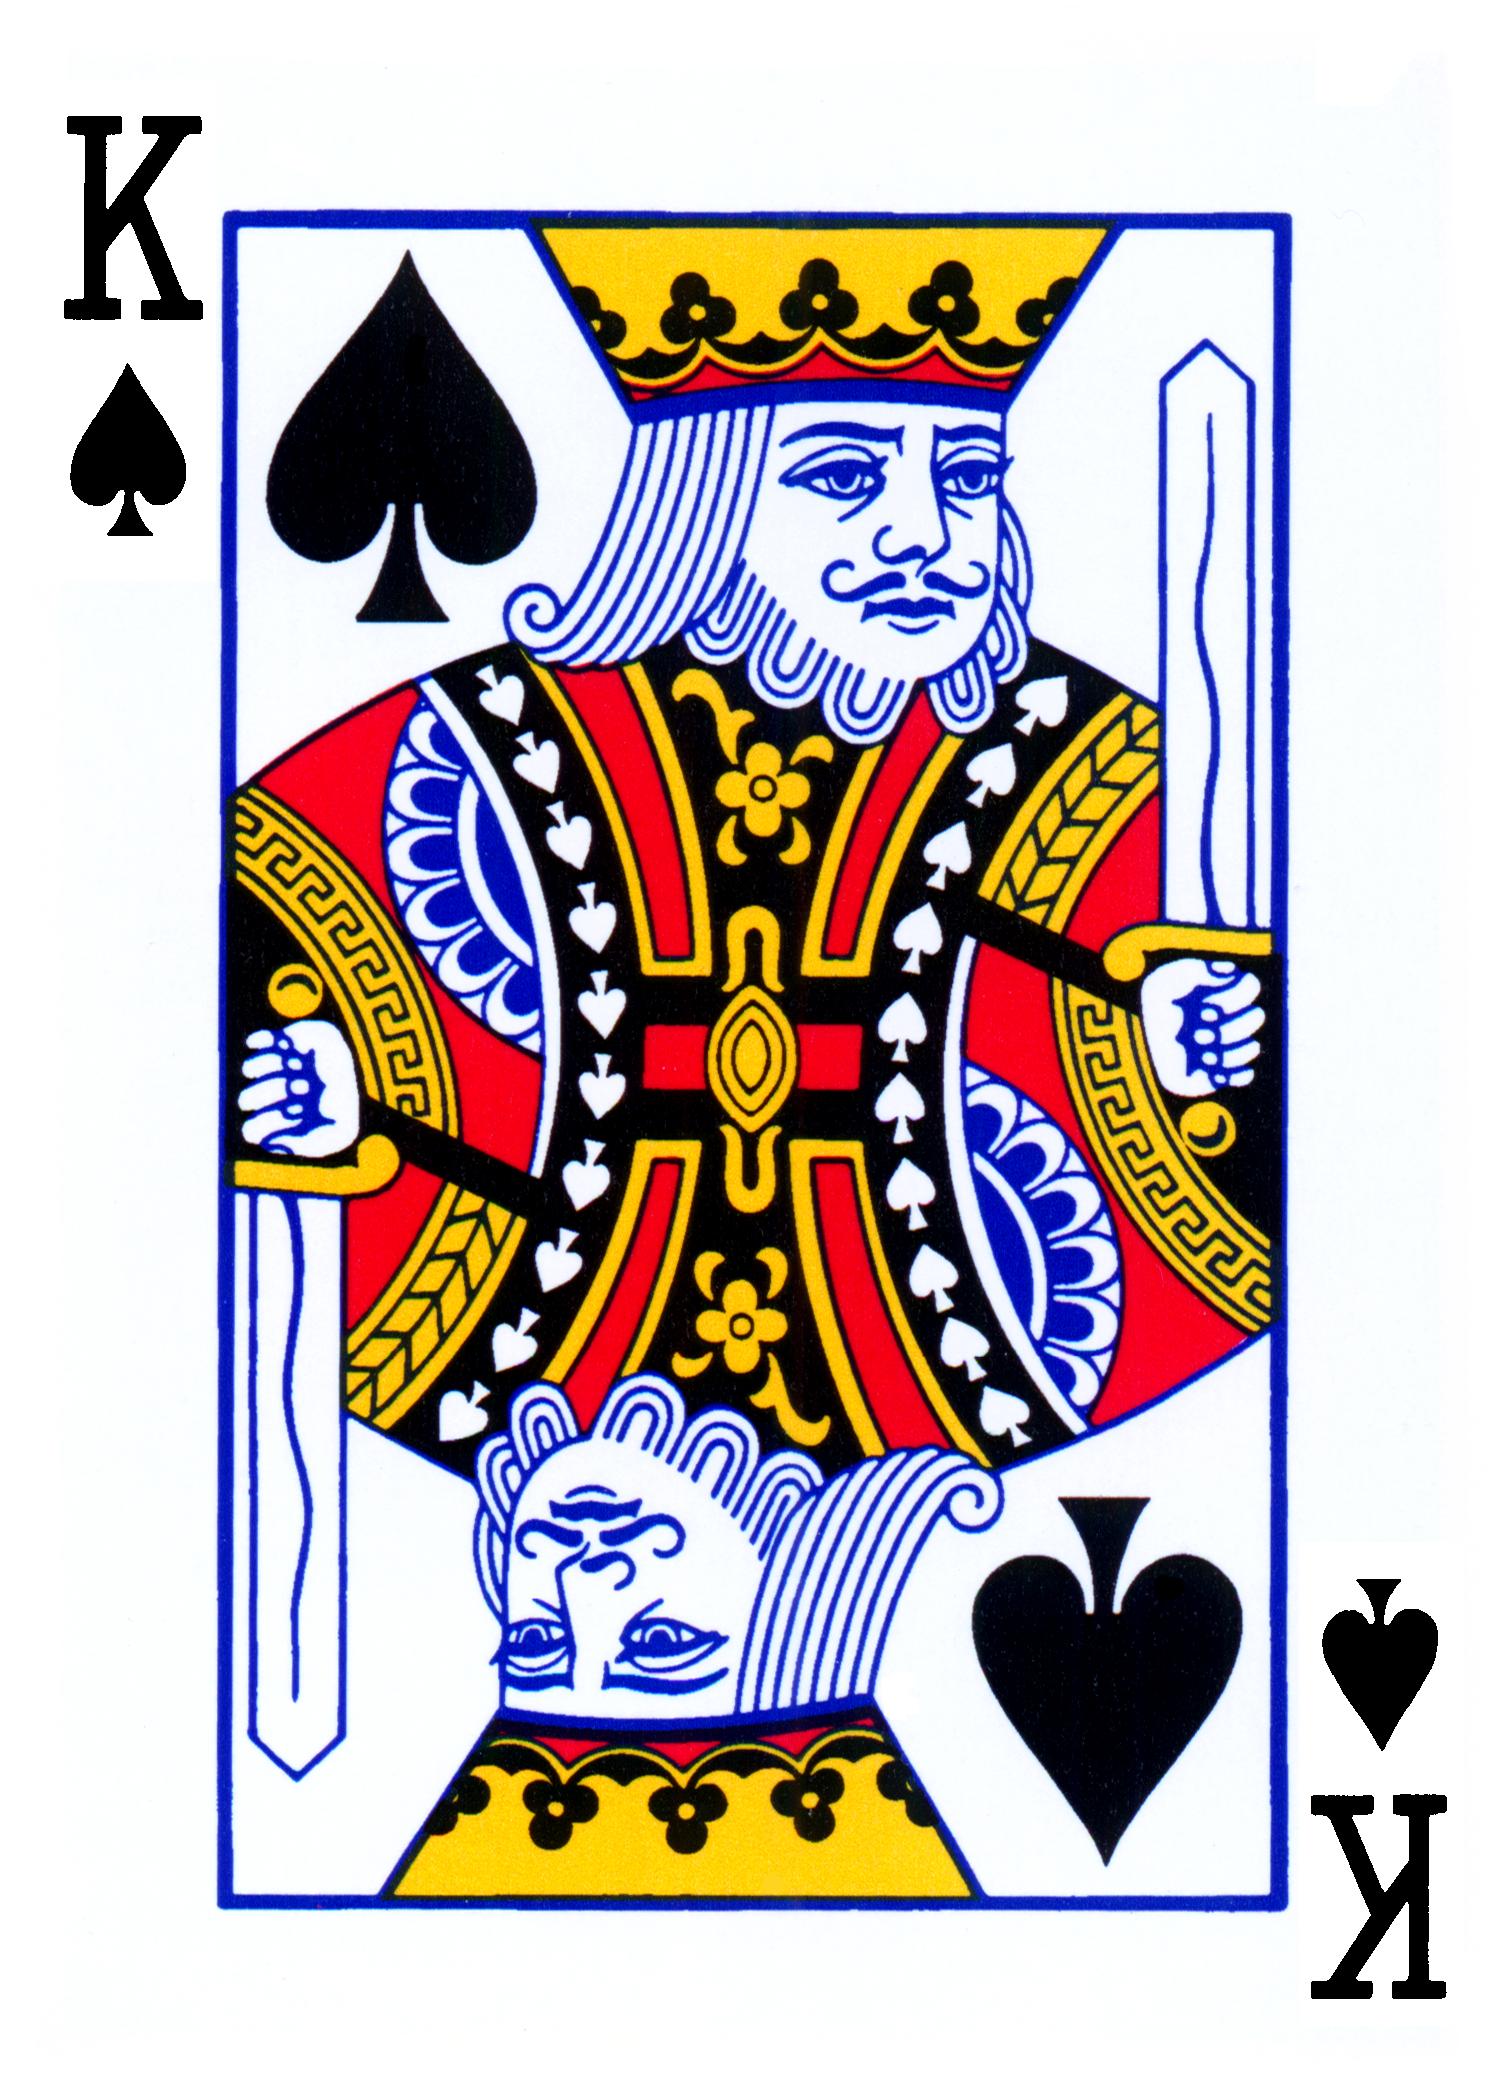 354 1 samuel 15 illustration inspiration king of